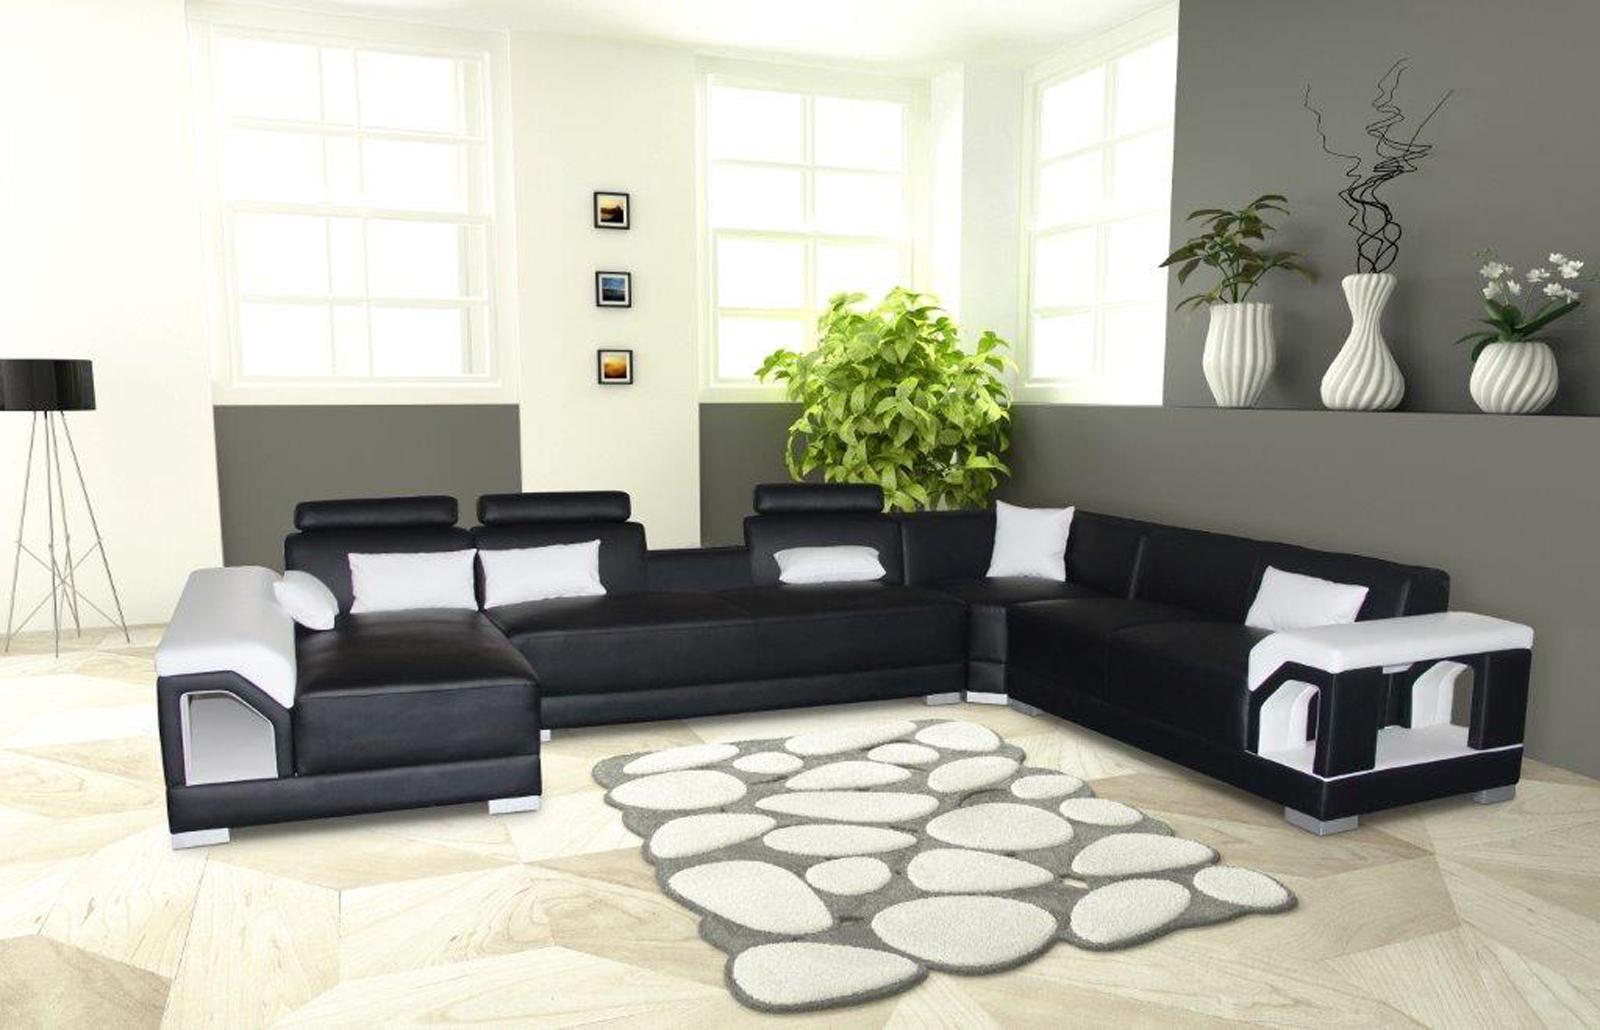 Sale Sofa Wohnlandschaft Eckcouch Schwarz Weiss Rechts Zippora